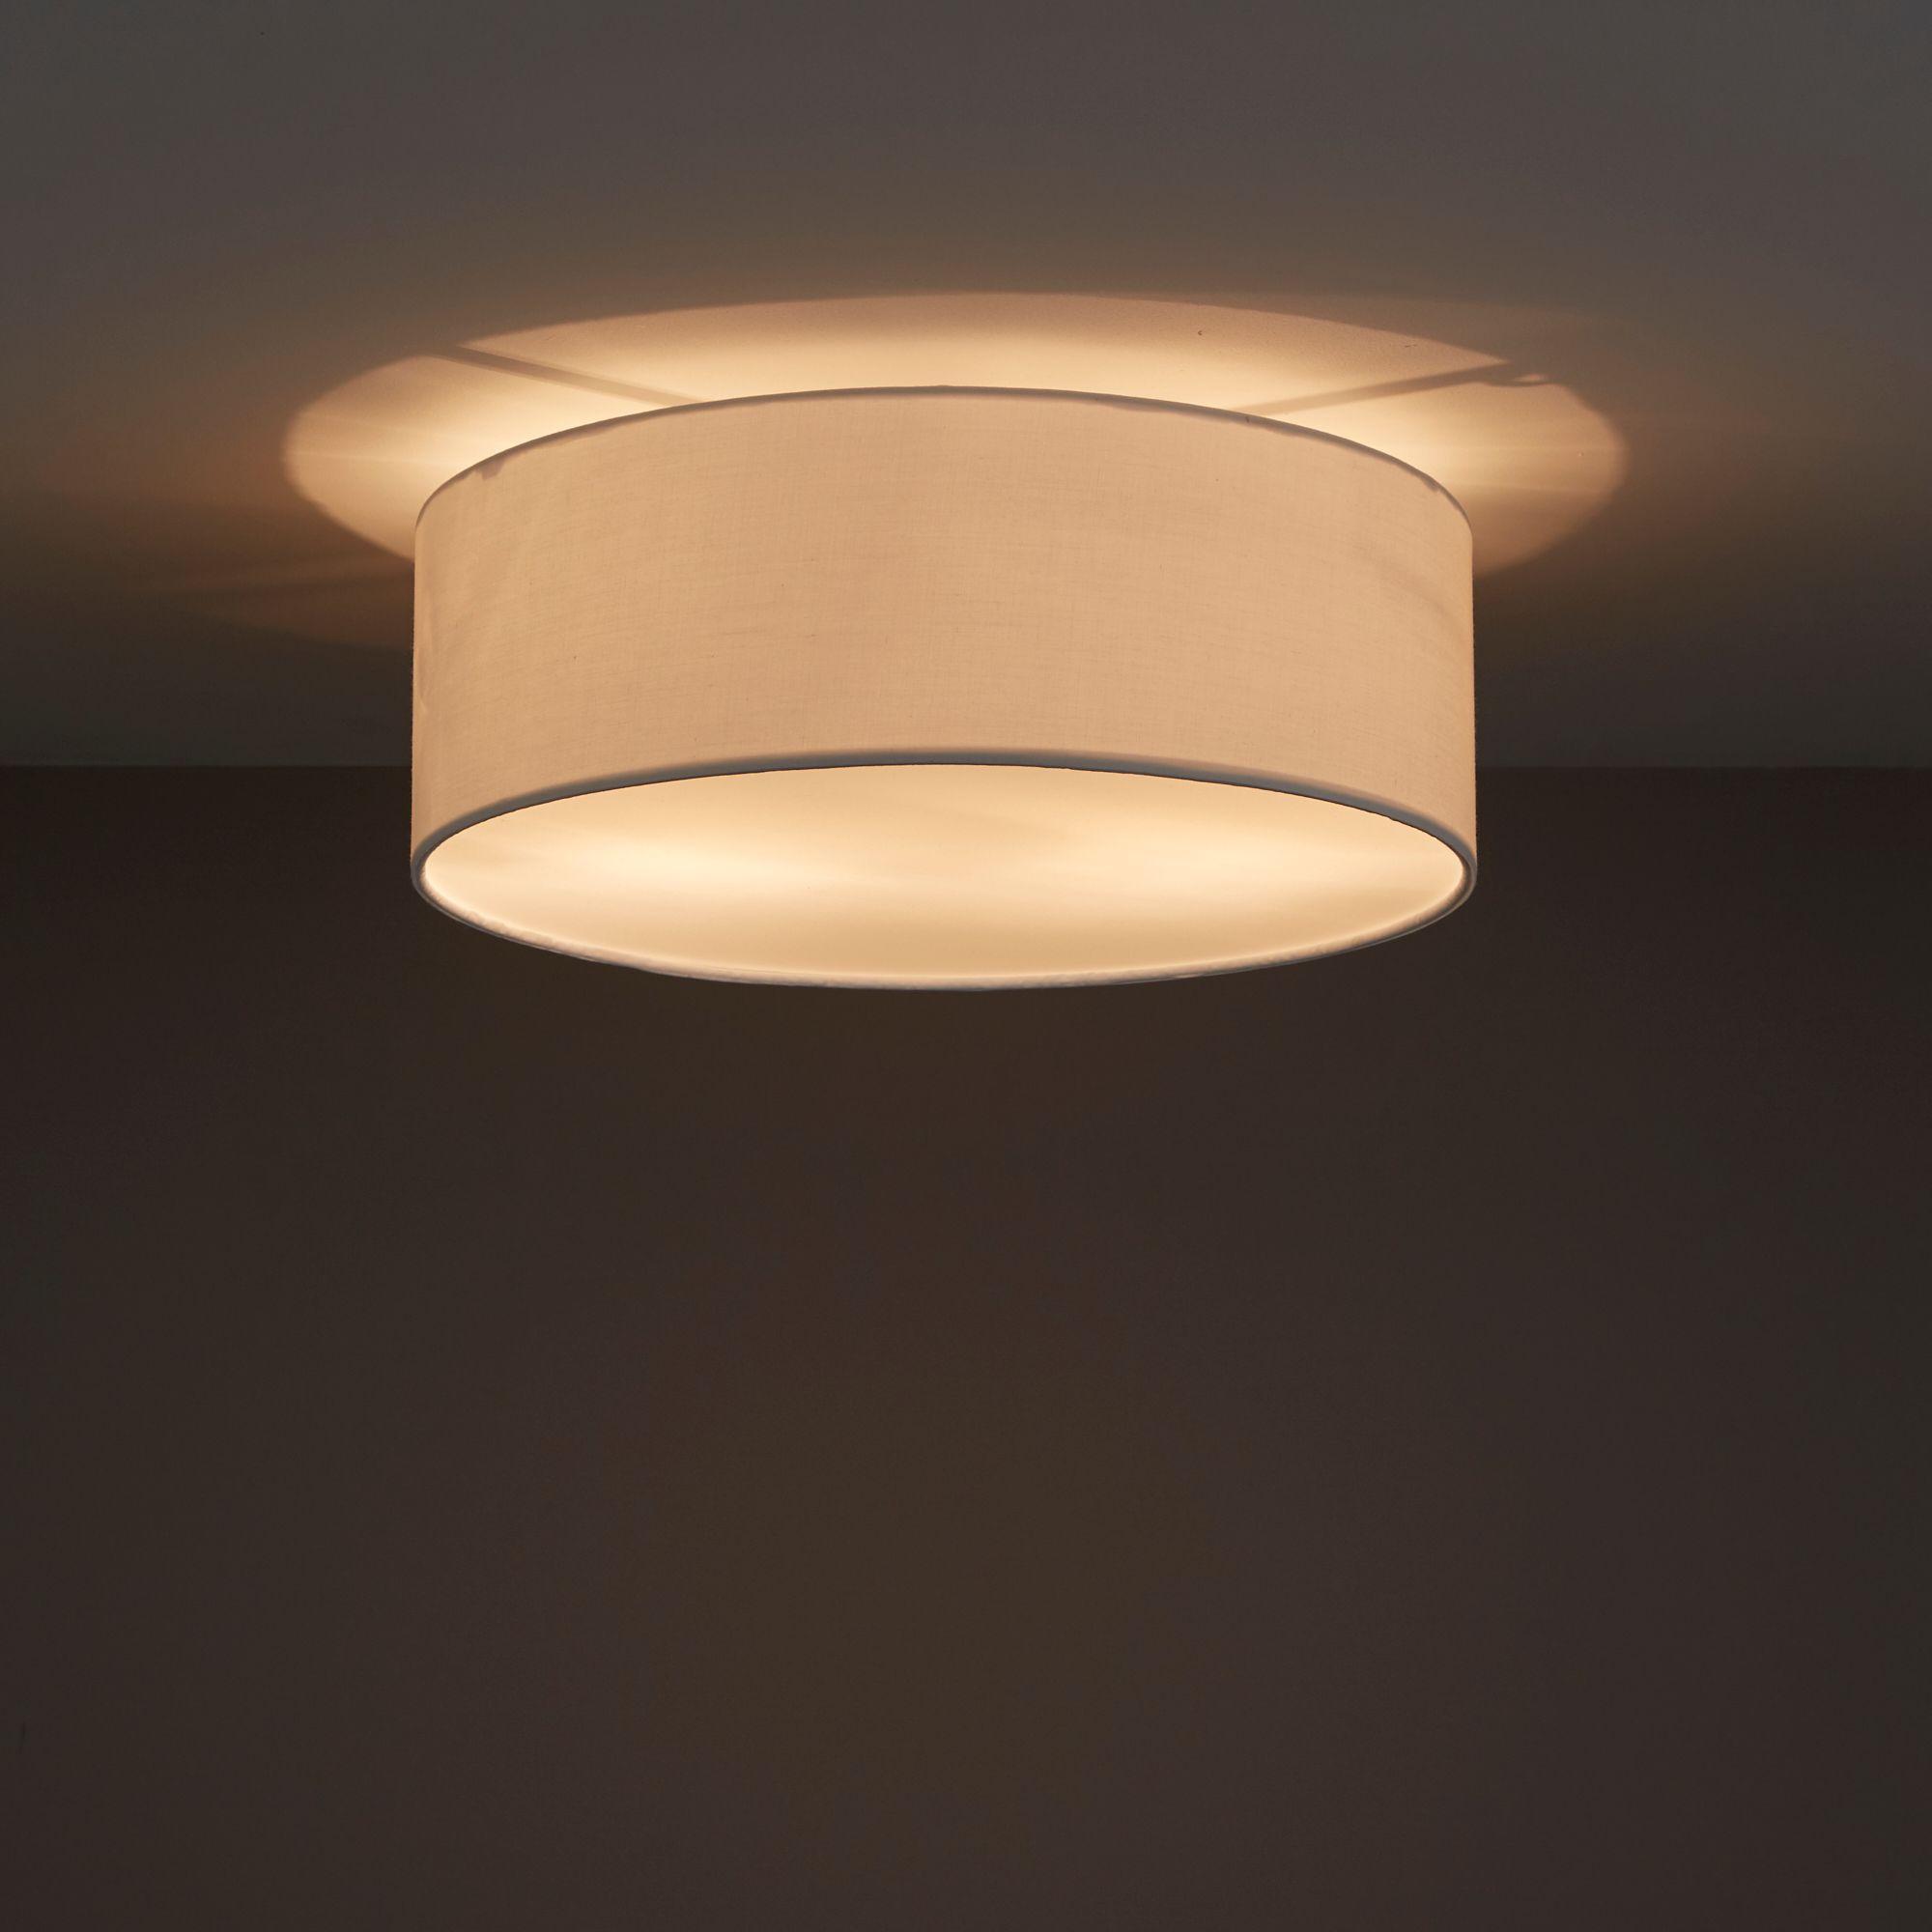 Sphera Brushed Cream 2 Lamp Ceiling Light Departments Diy At B Q